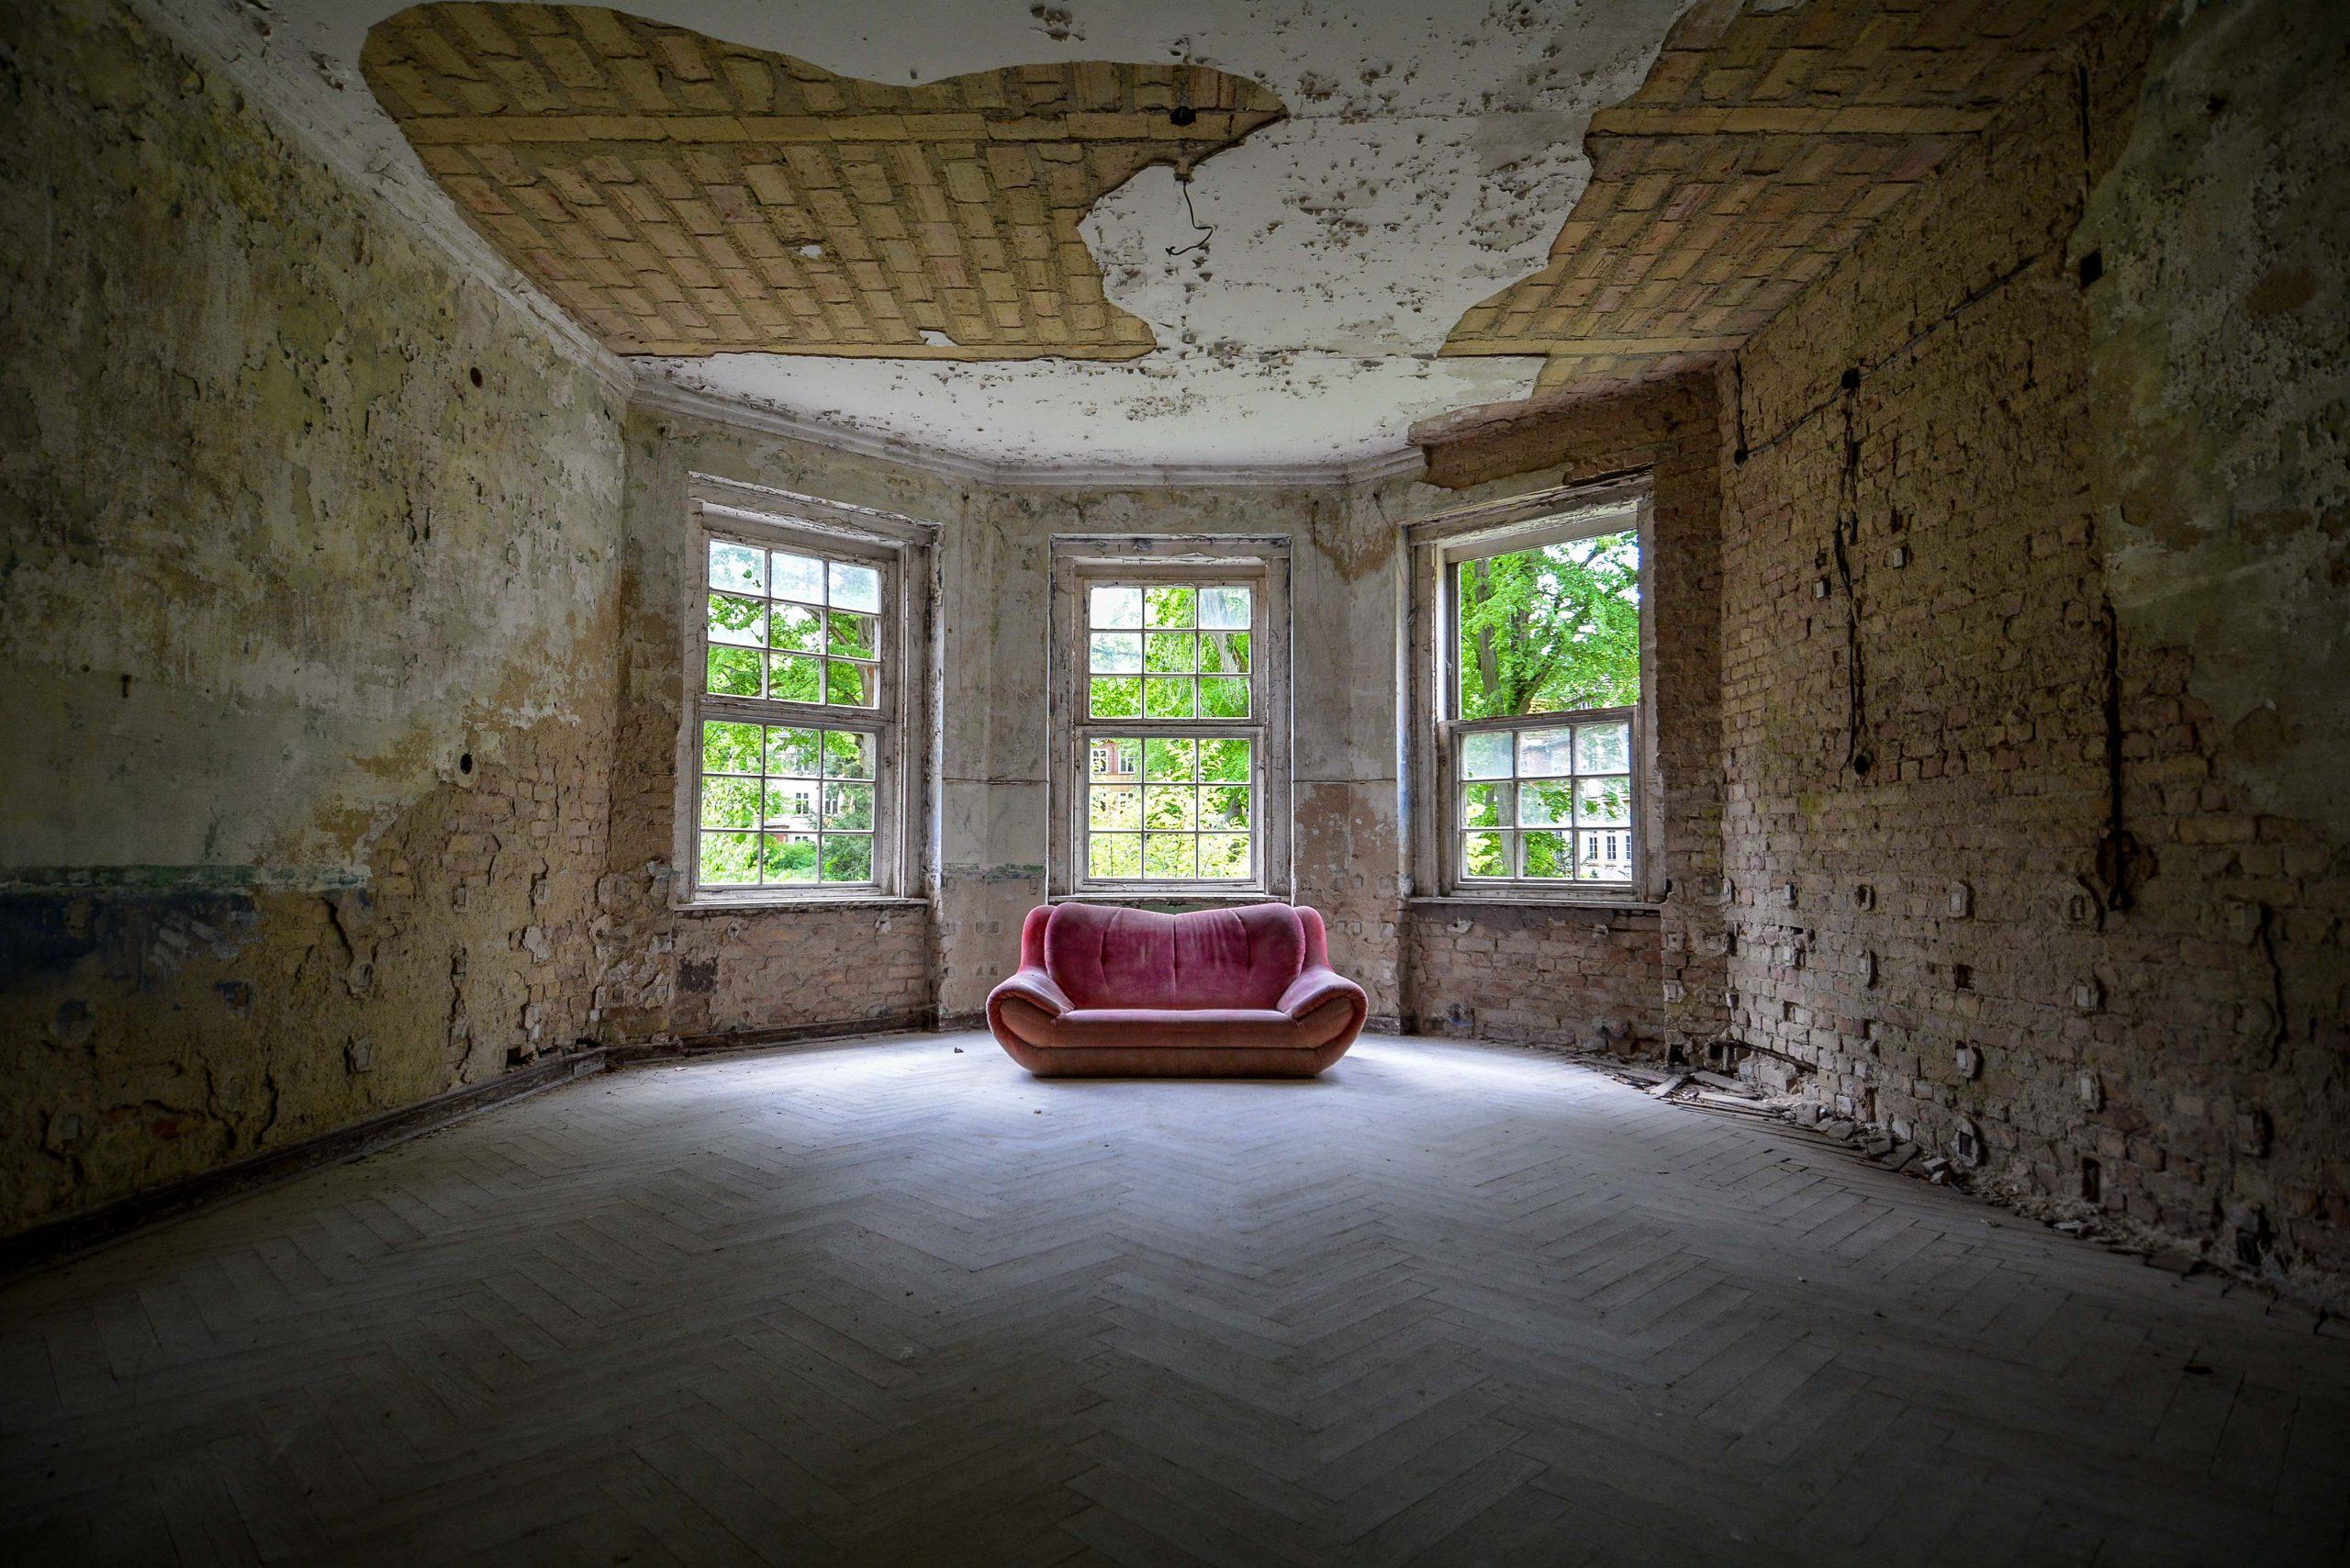 red couch abandoned sanatorium hospital tuberkulose heilstaette grabowsee sanatorium hospital oranienburg lost places abandoned urbex brandenburg germany deutschland